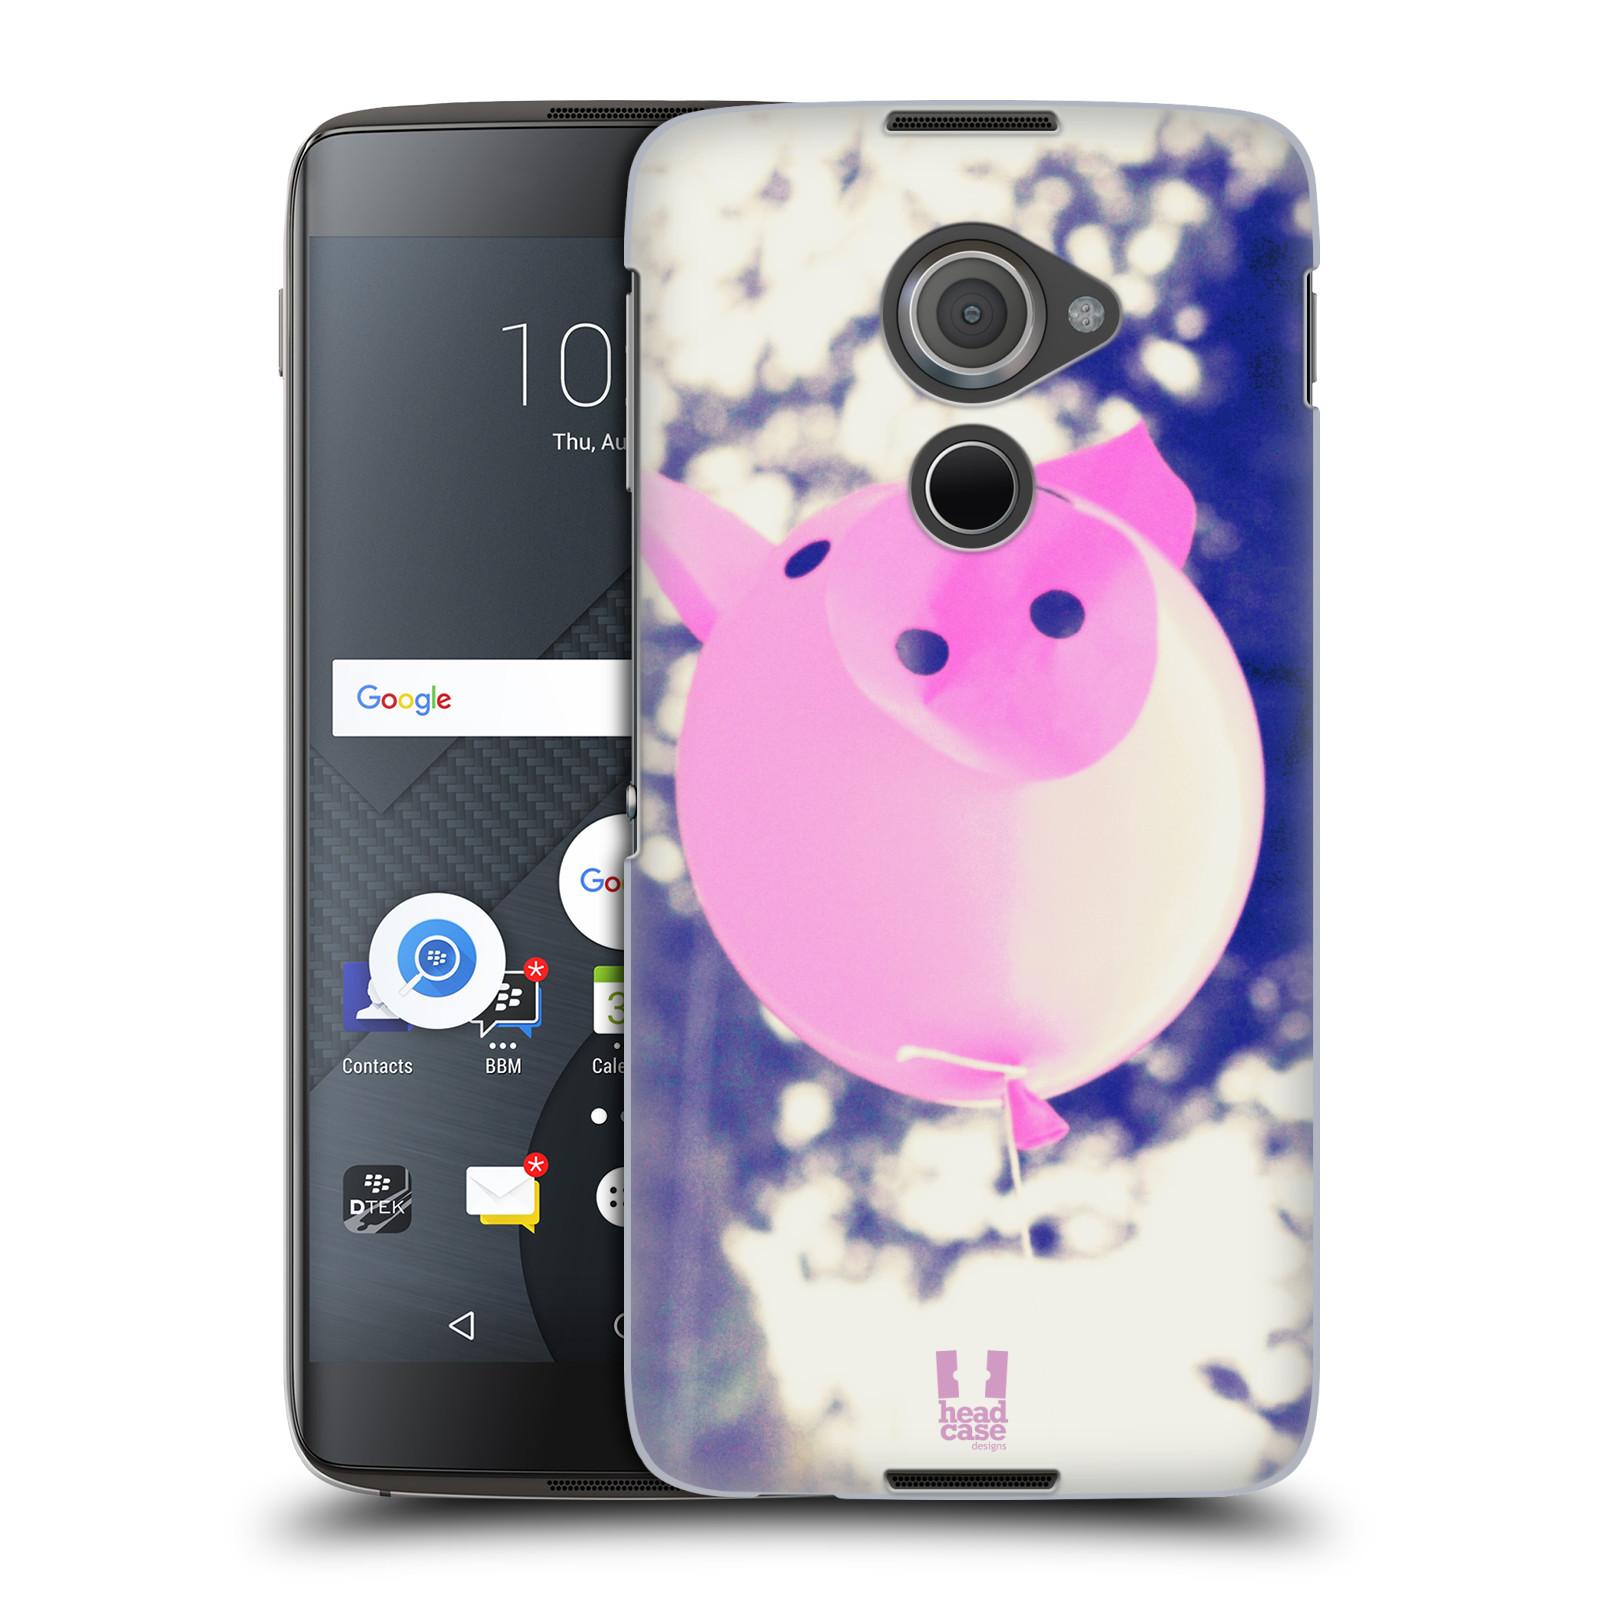 Plastové pouzdro na mobil Blackberry DTEK60 (Argon) - Head Case BALON PAŠÍK